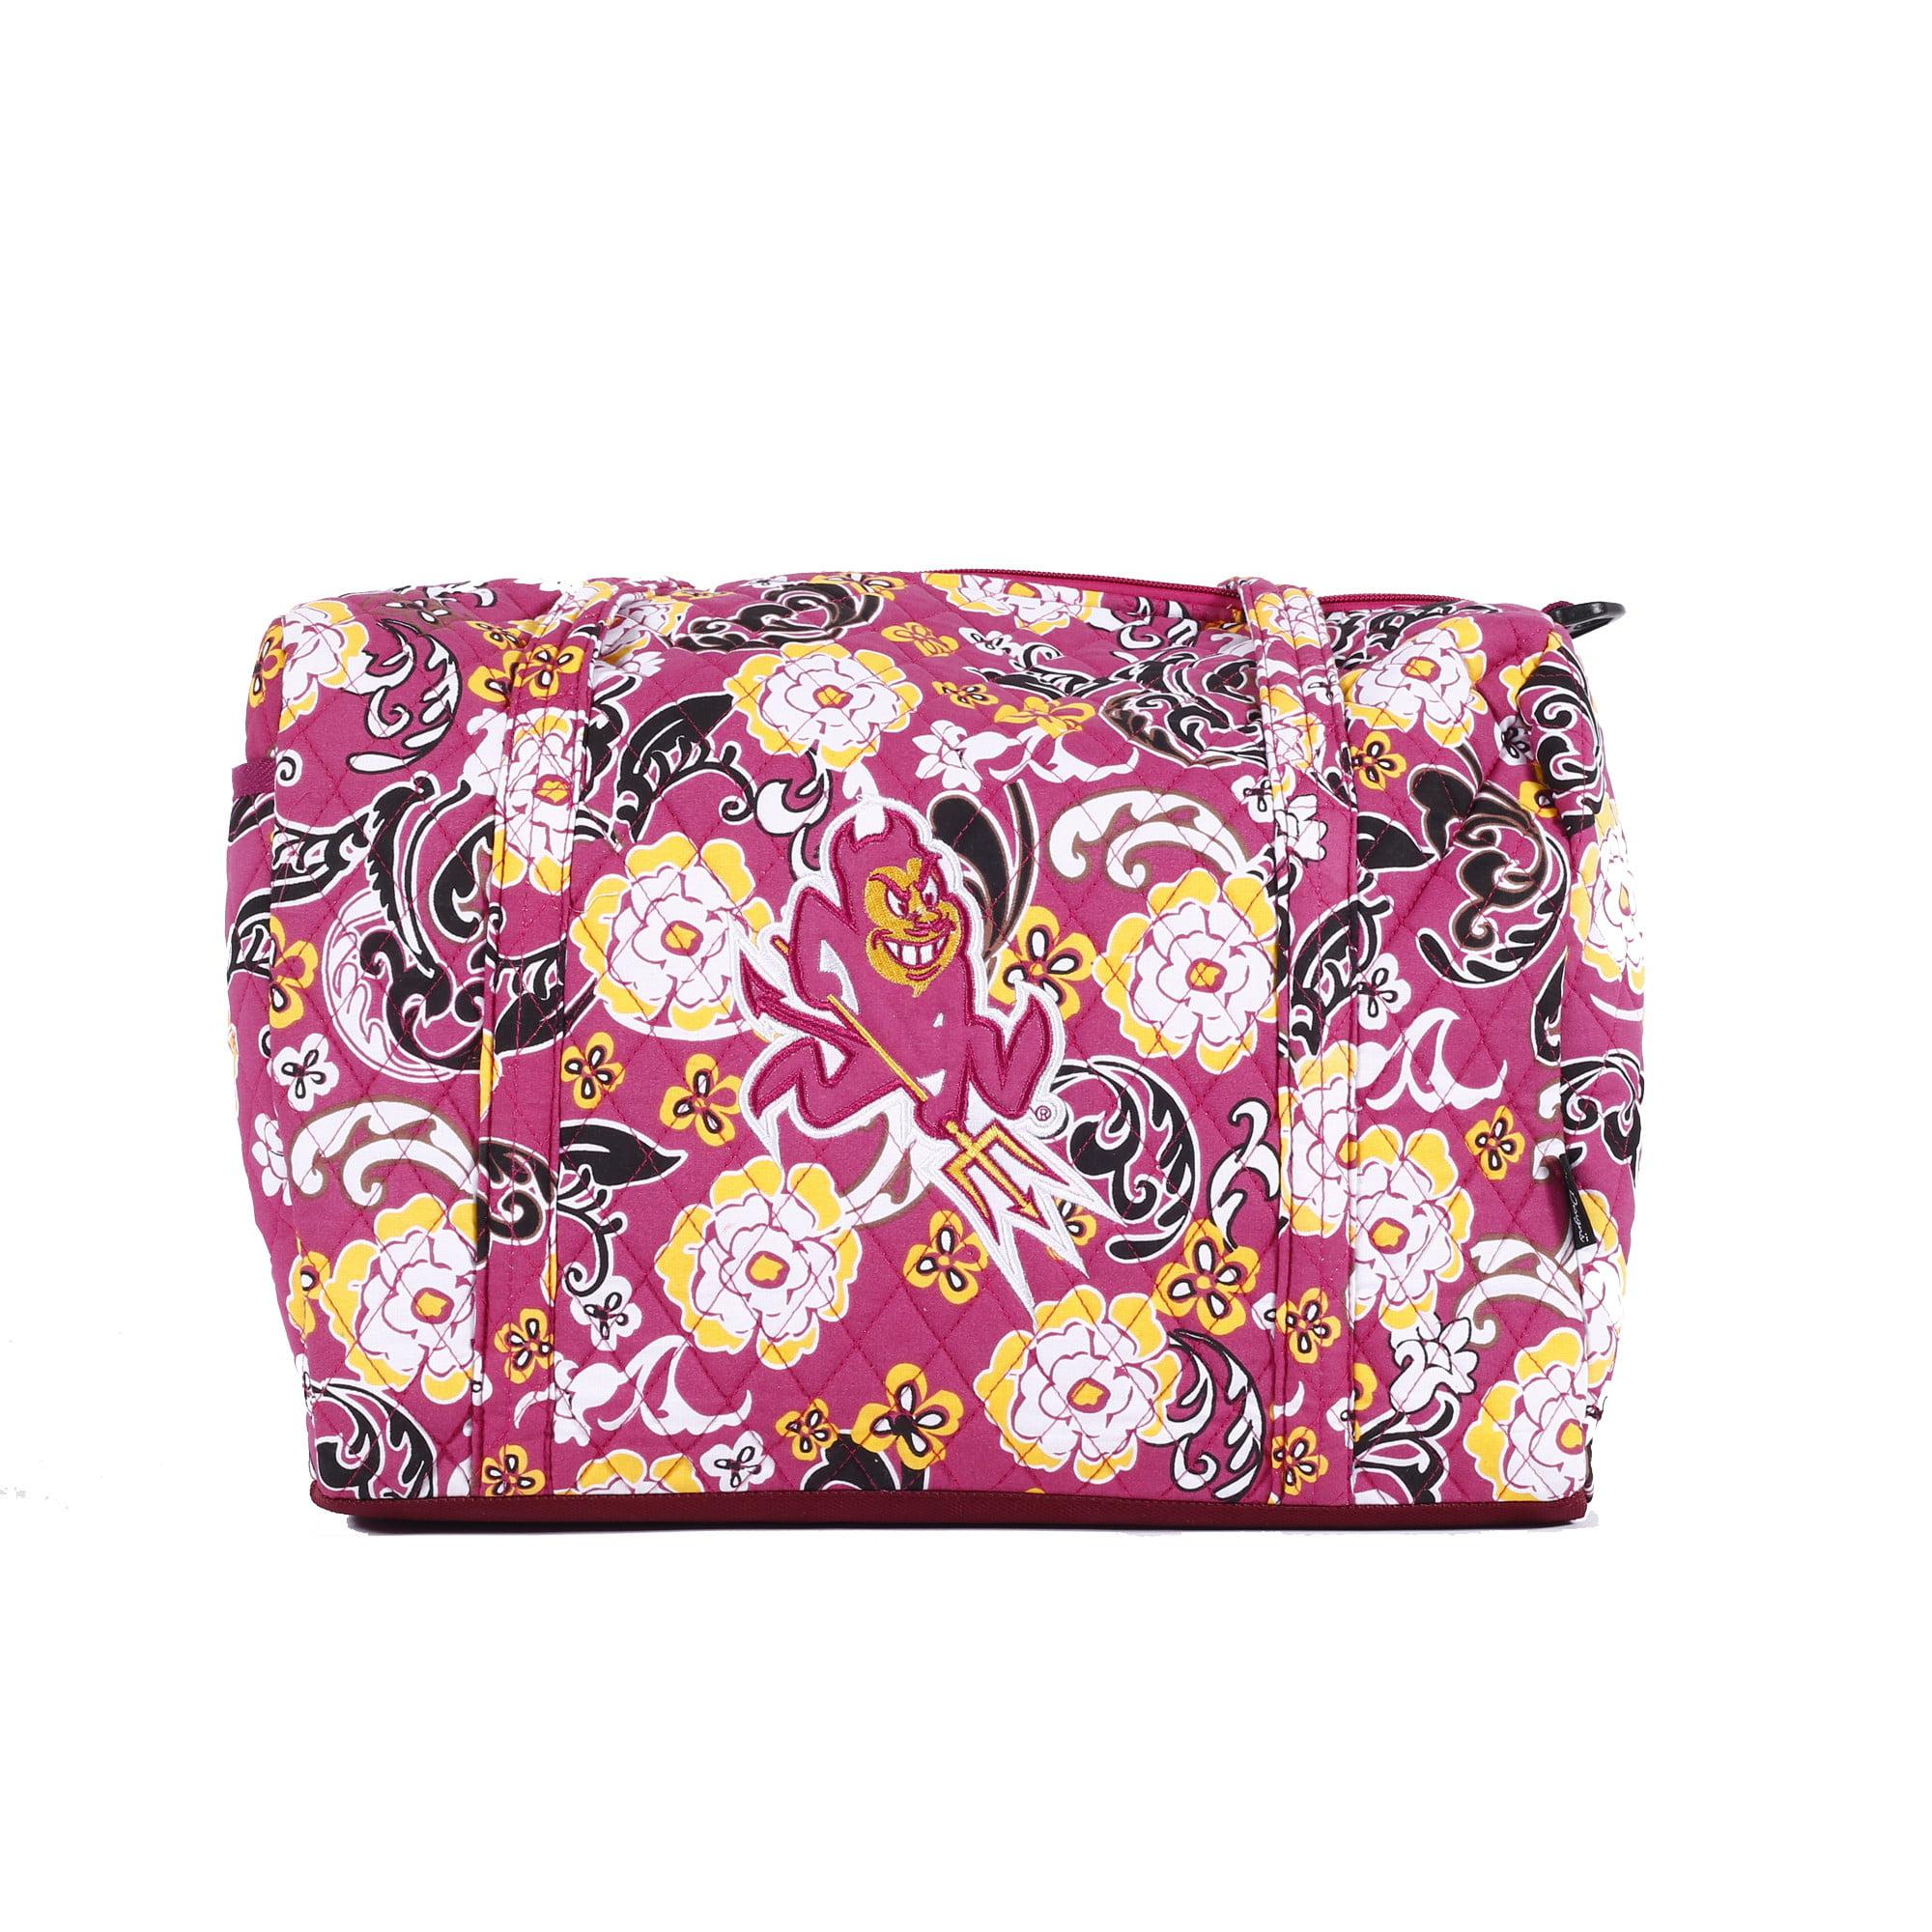 Arizona State Sundevils Mini Duffle Bag by